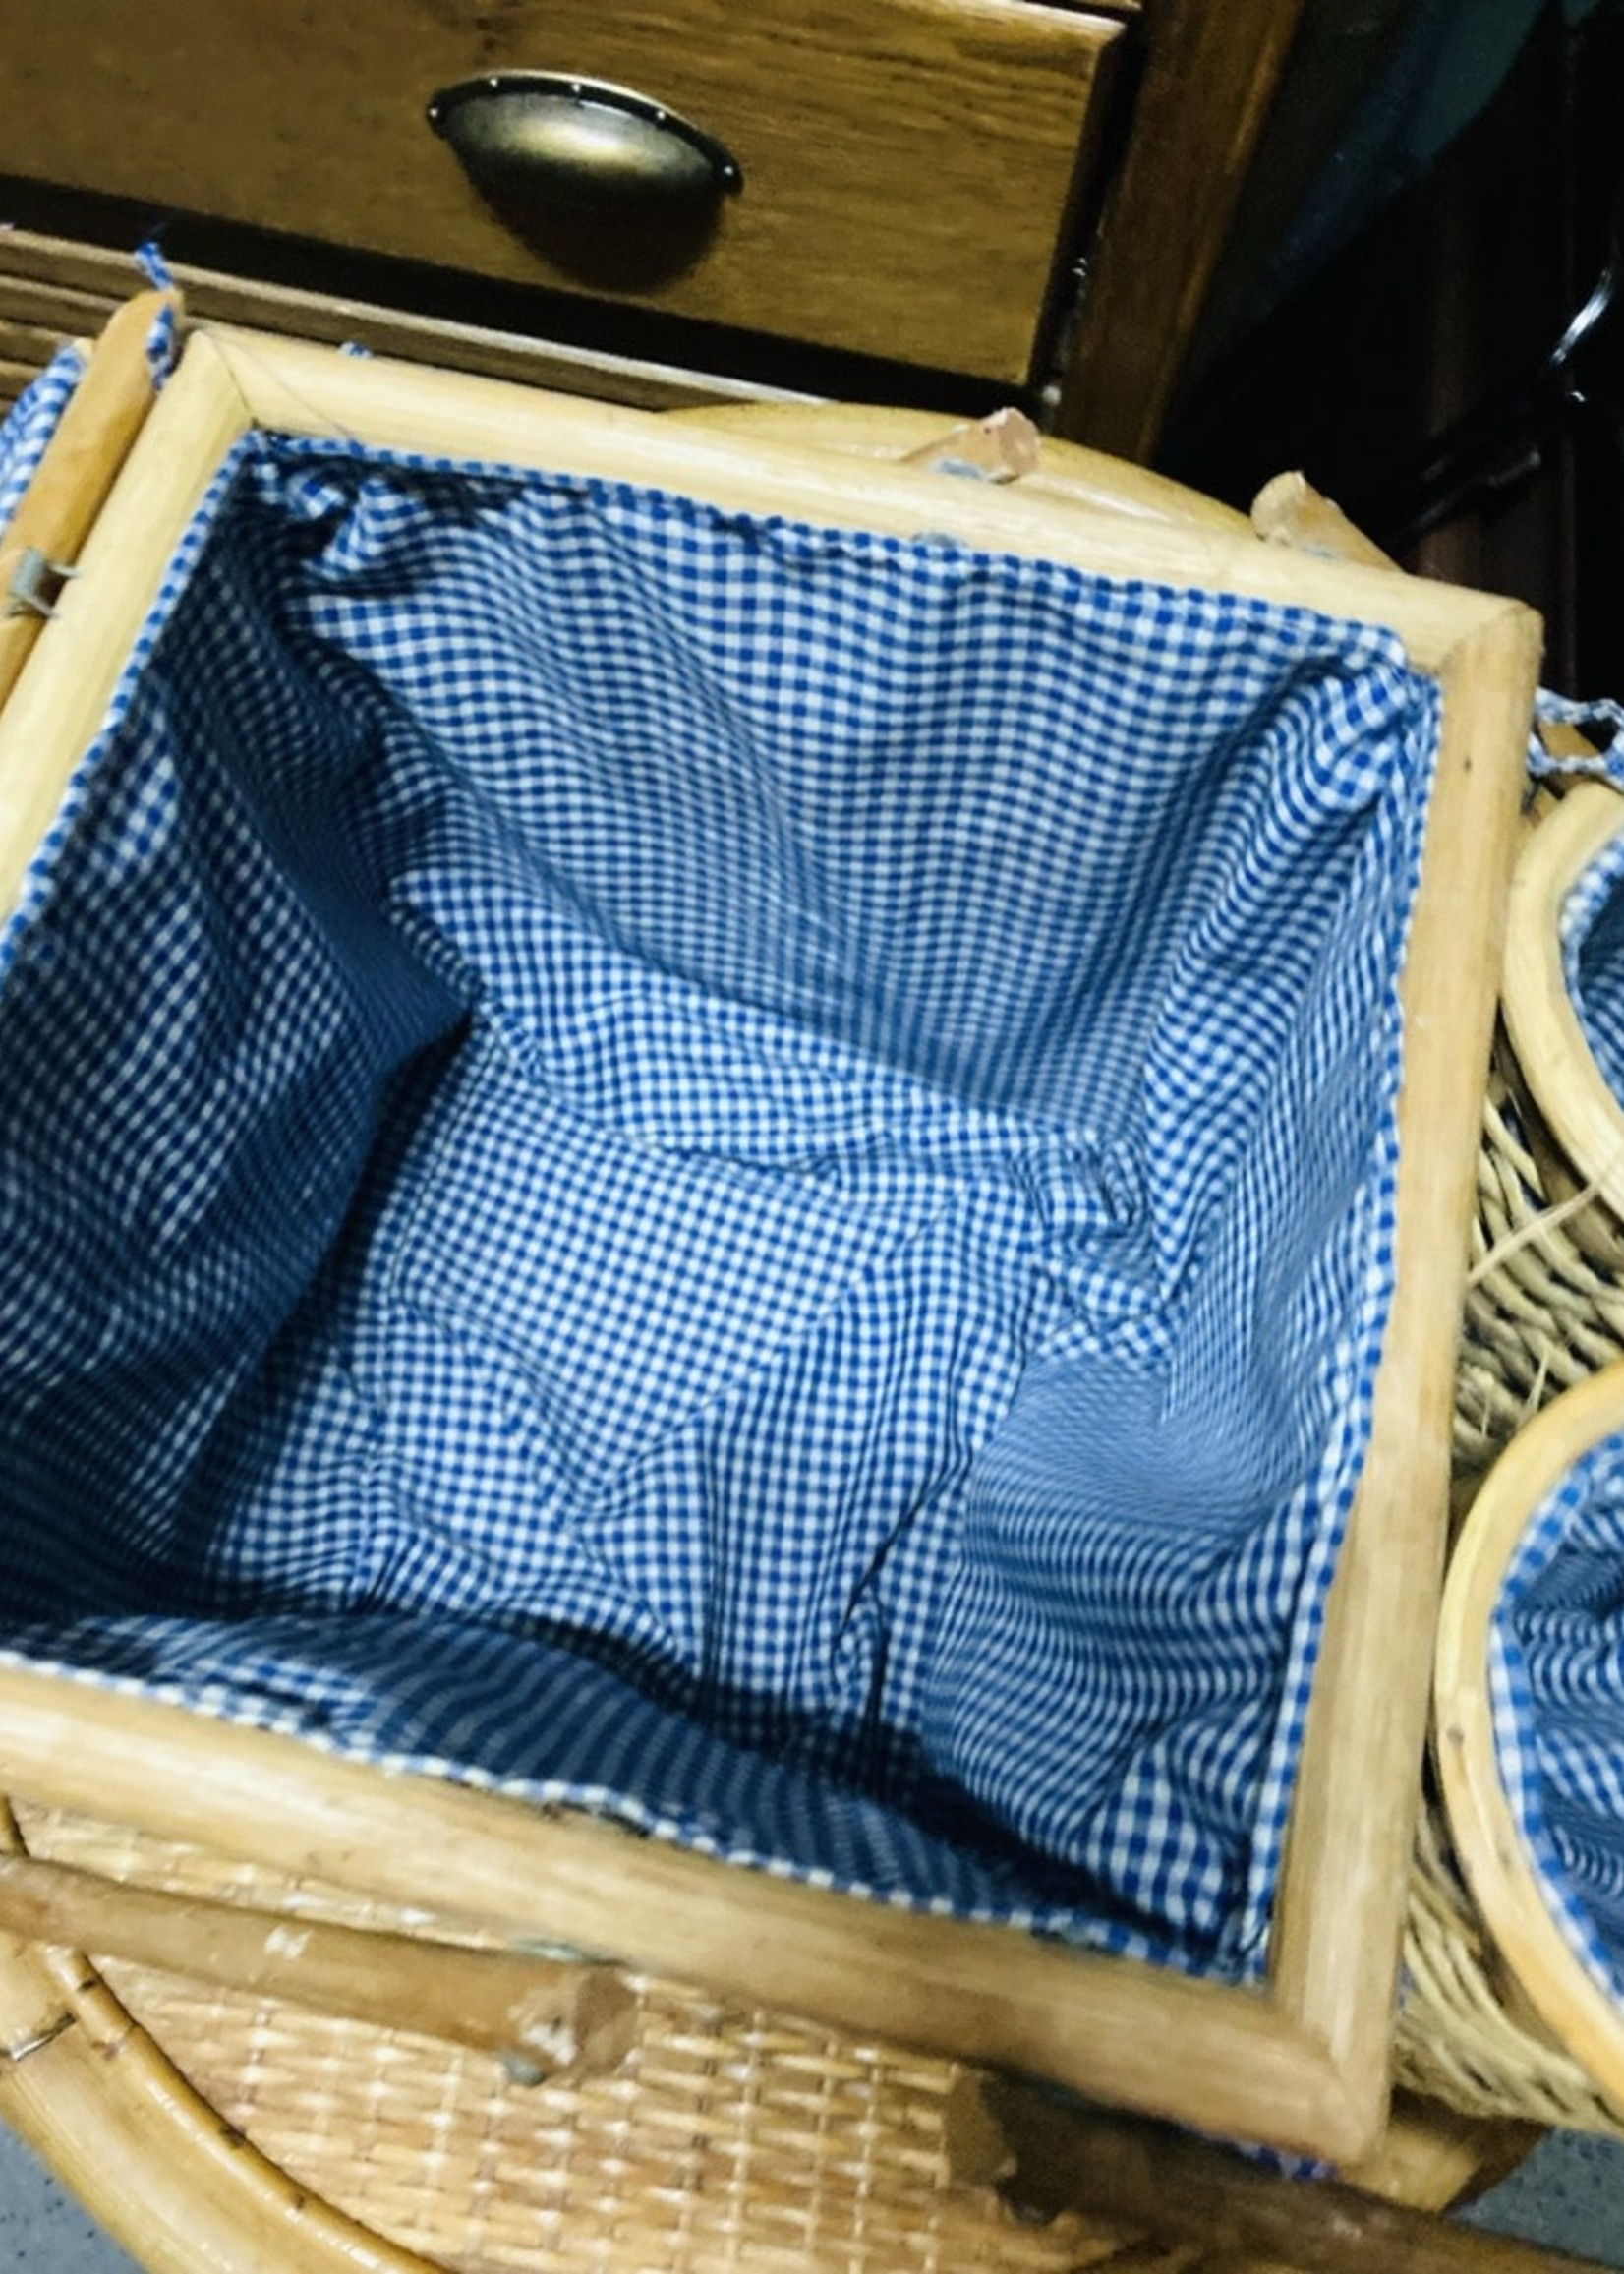 Pic nic basket in rattan